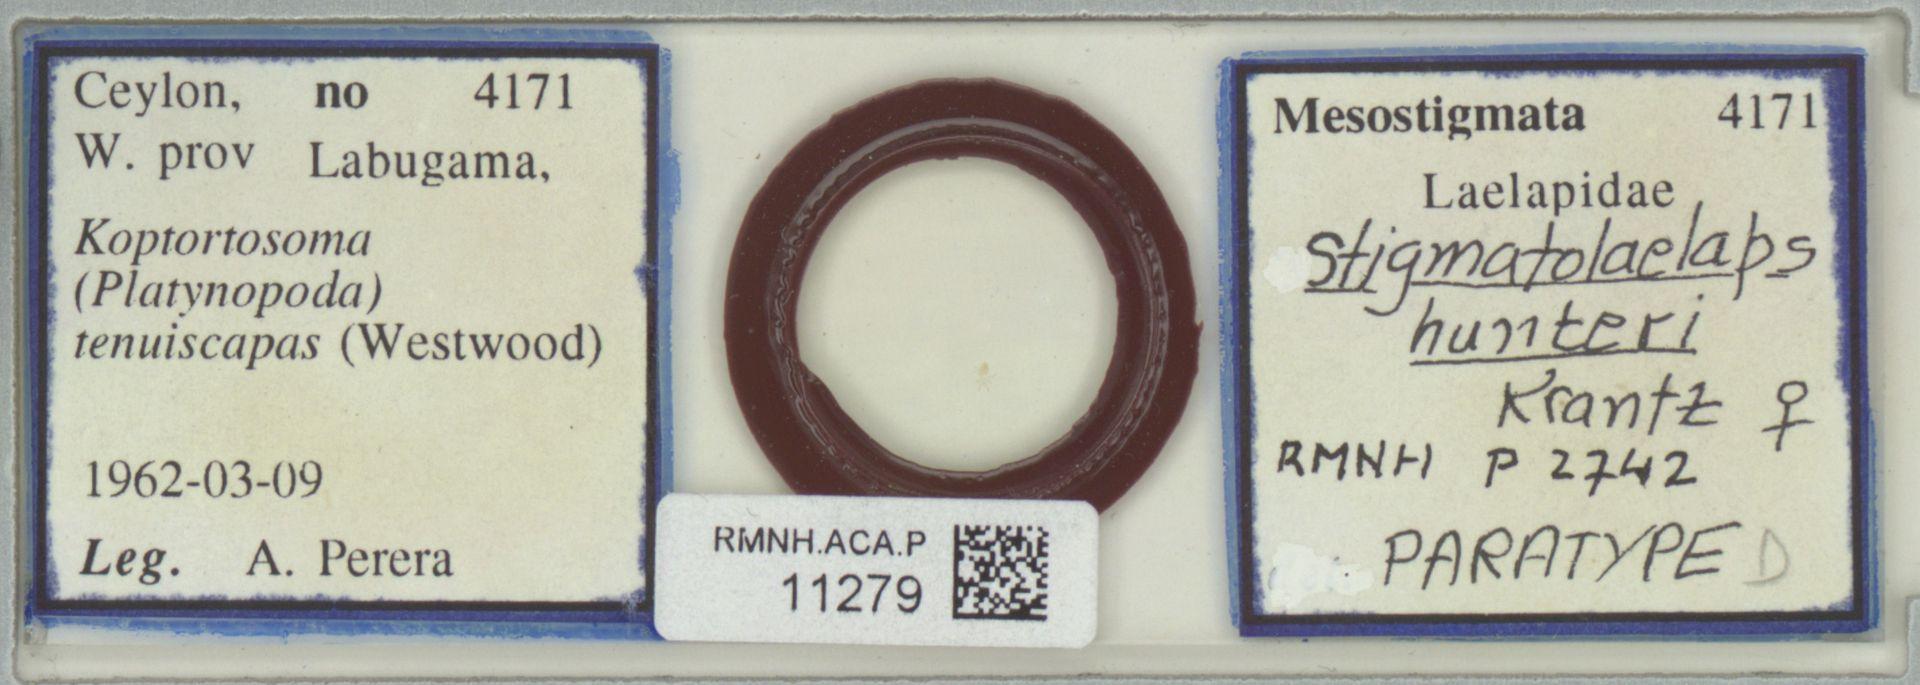 RMNH.ACA.P.11279 | Stigmatolaelaps hunteri Krantz